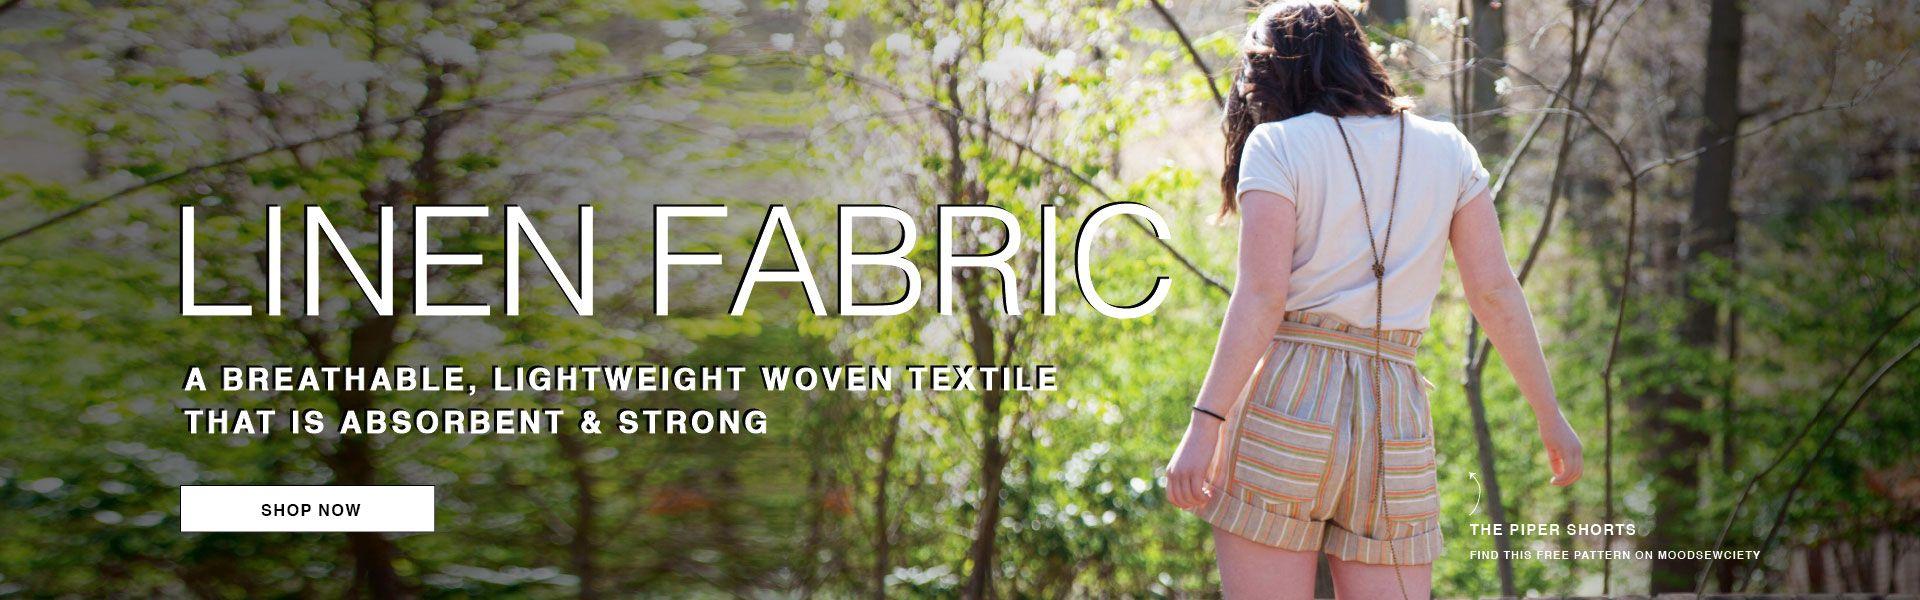 Premium Linen Fabrics - Shop Now!